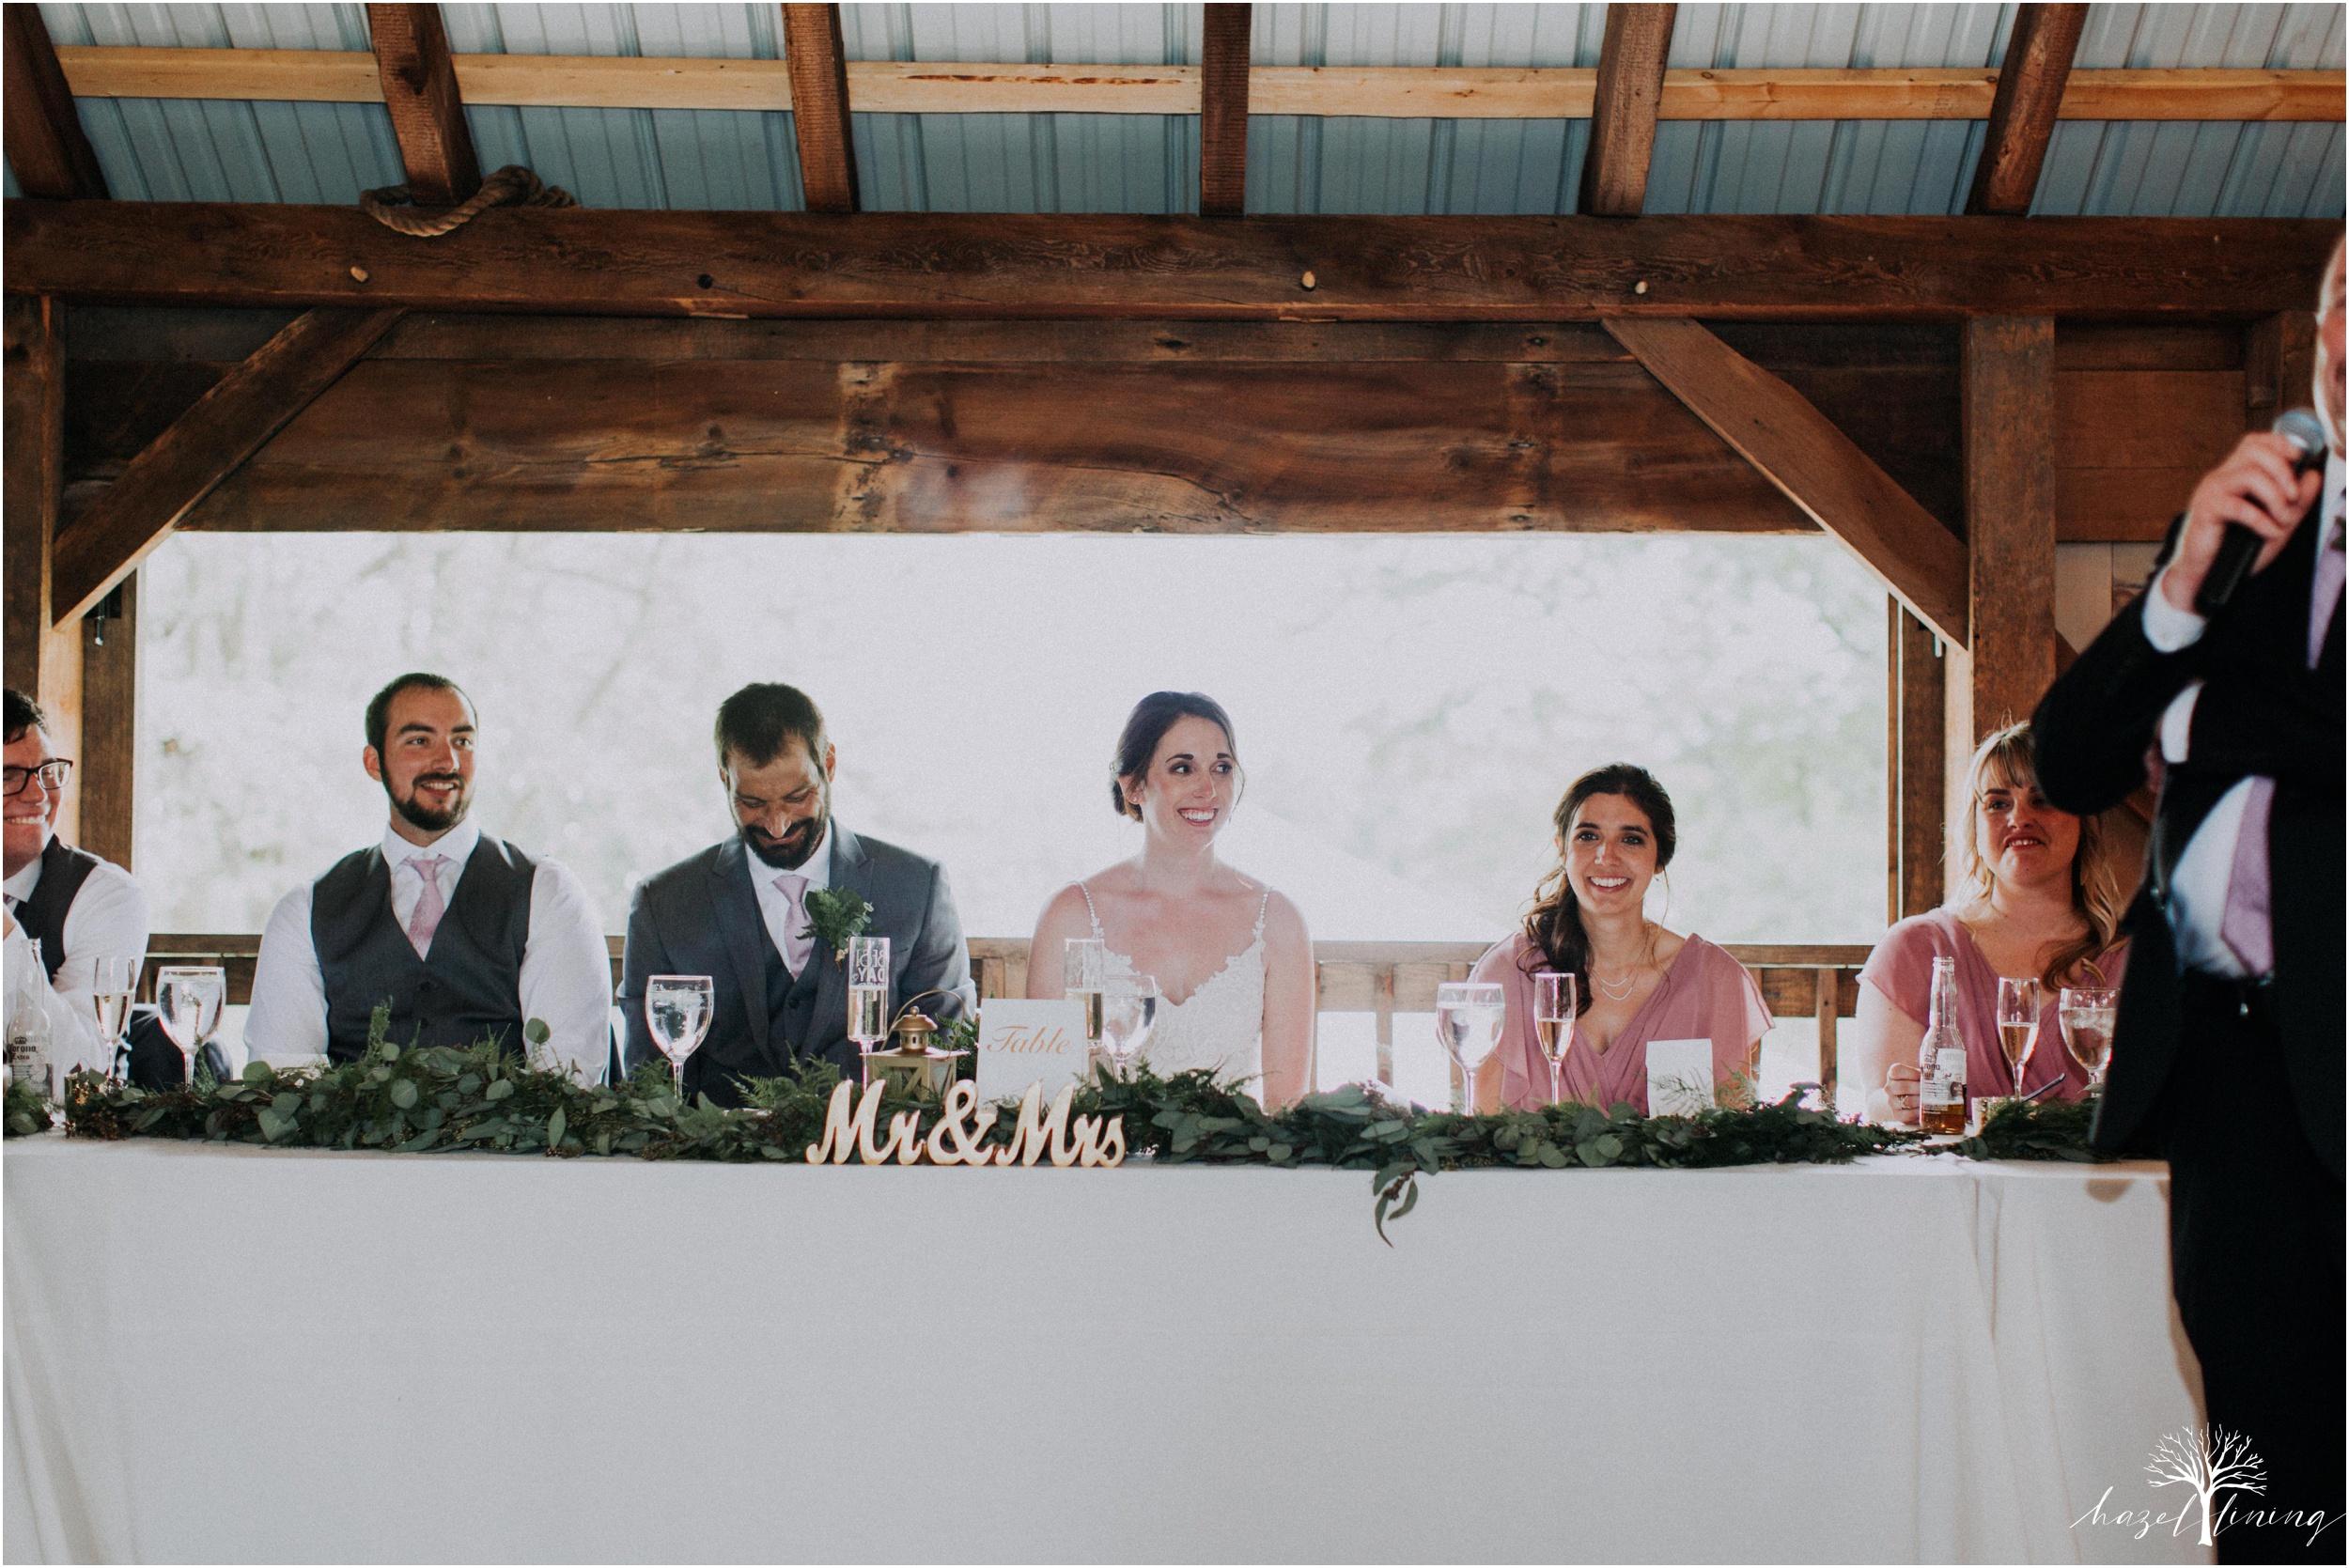 hazel-lining-travel-wedding-elopement-photography-lisa-landon-shoemaker-the-farm-bakery-and-events-bucks-county-quakertown-pennsylvania-summer-country-outdoor-farm-wedding_0119.jpg